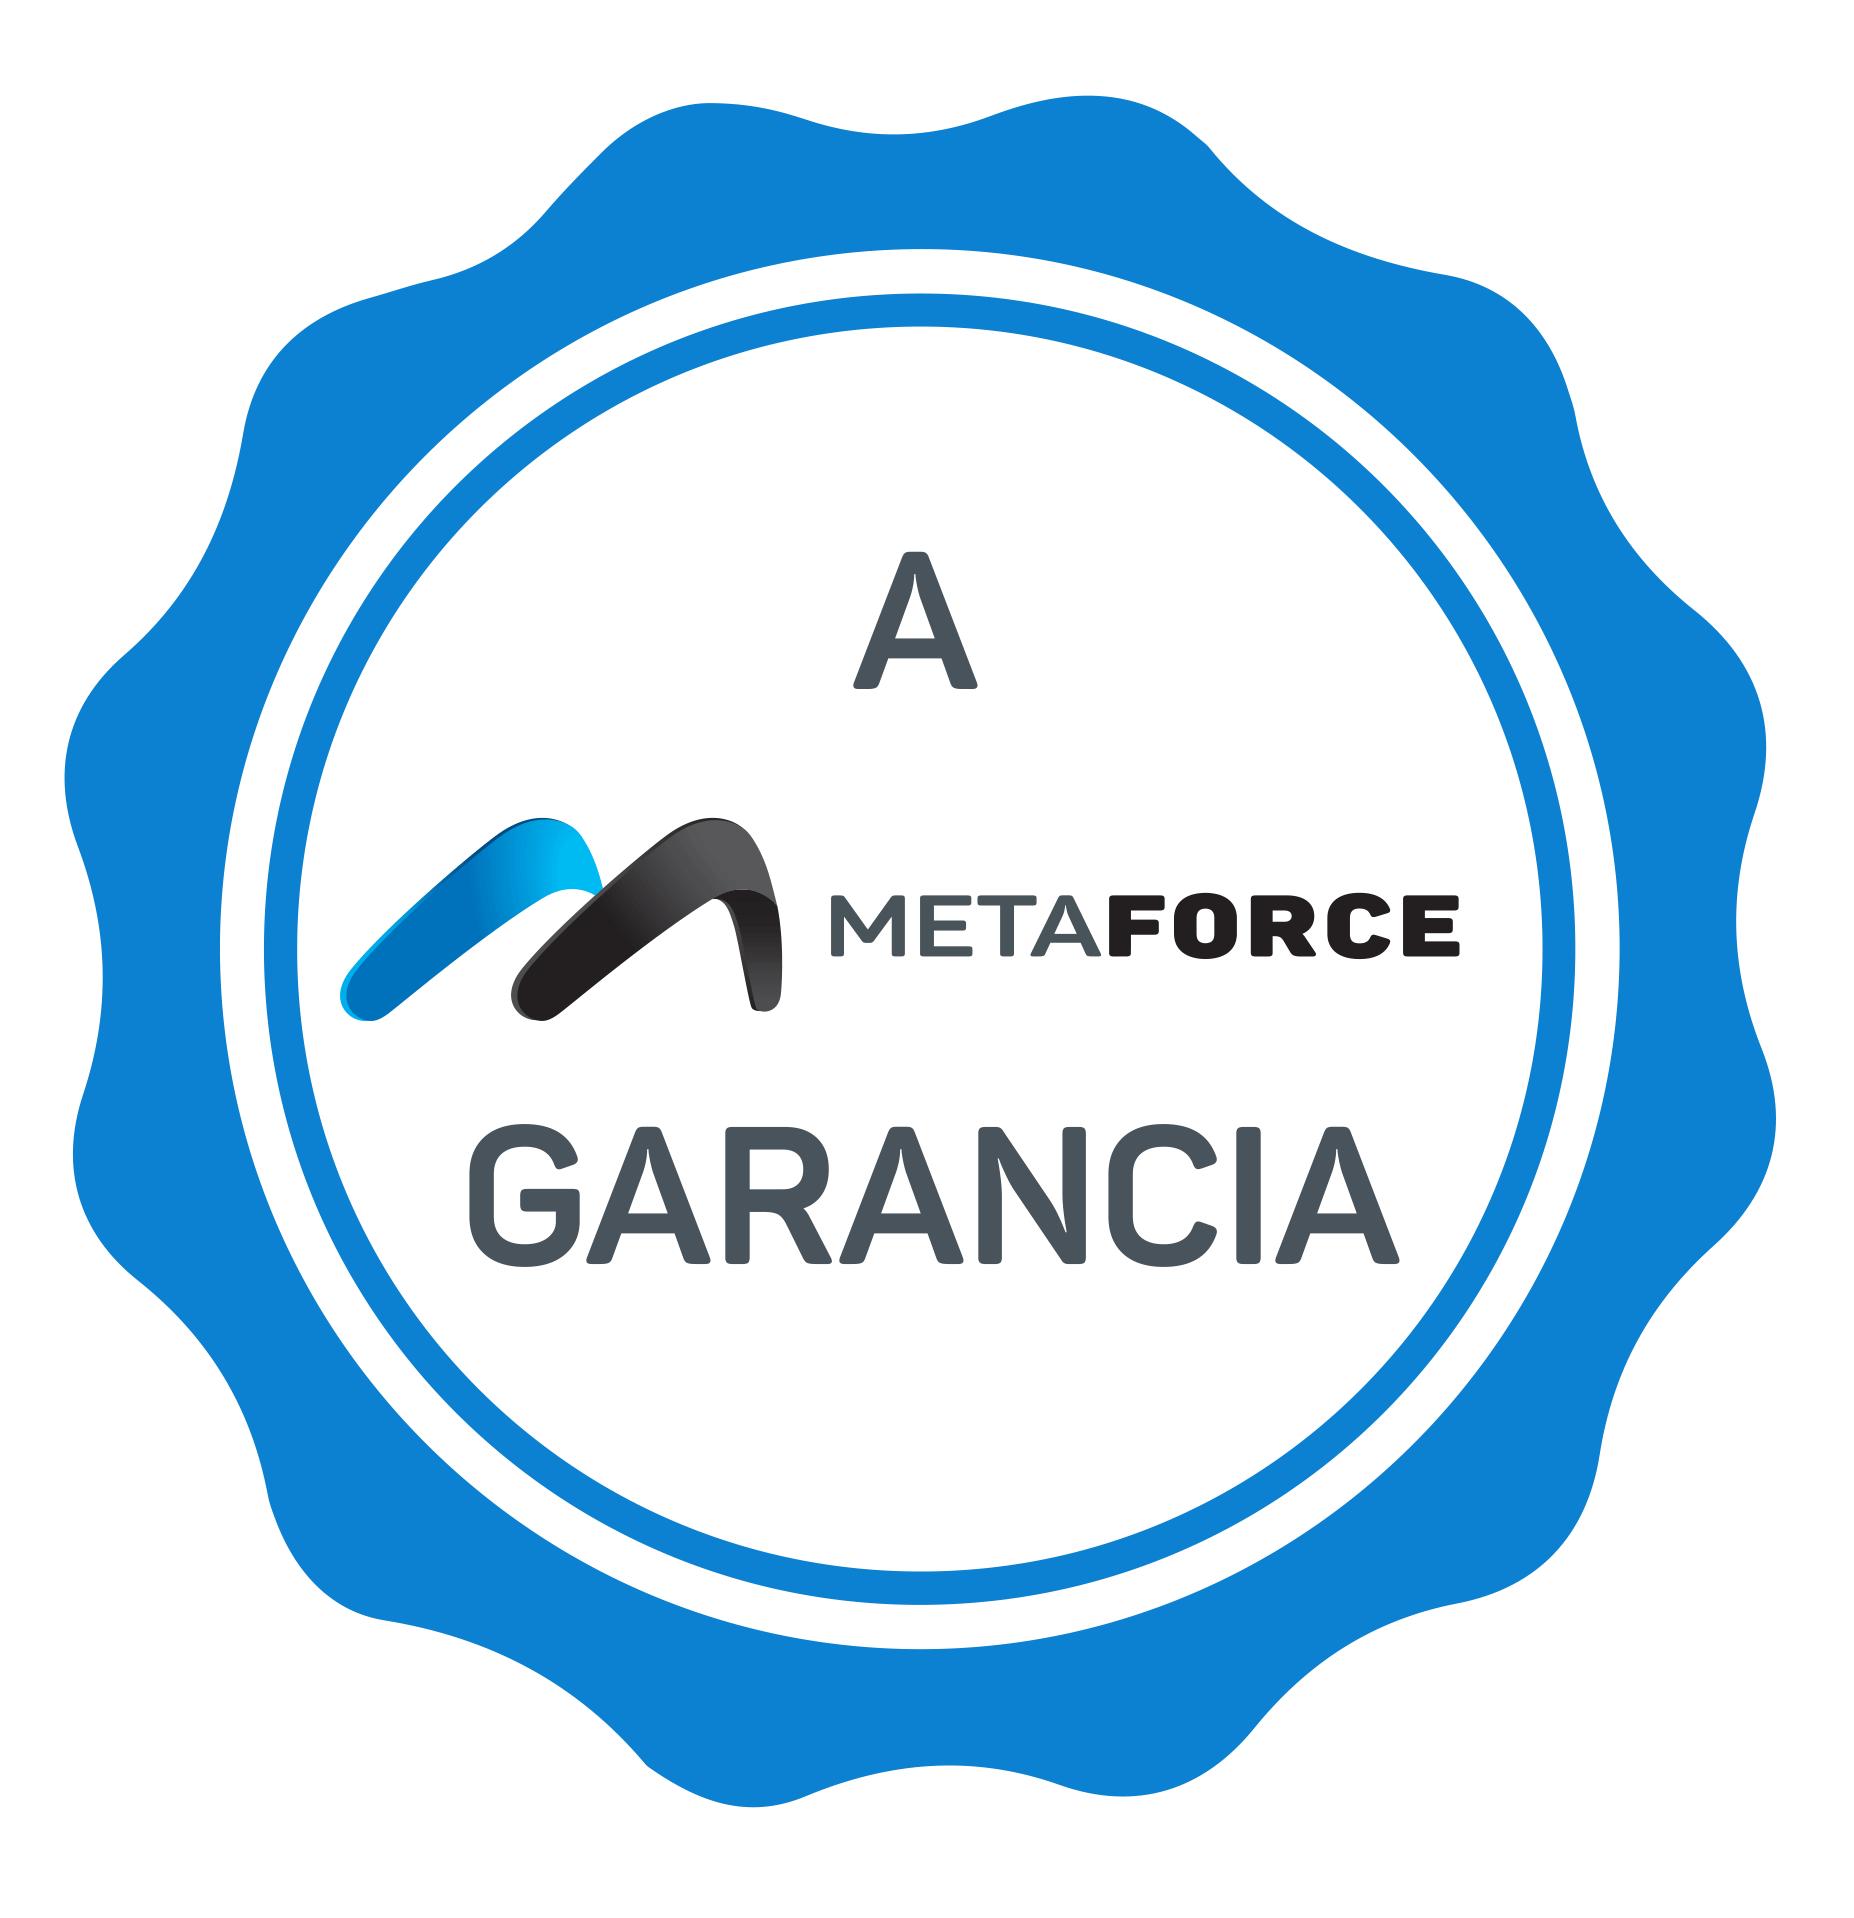 MetaForce Garancia